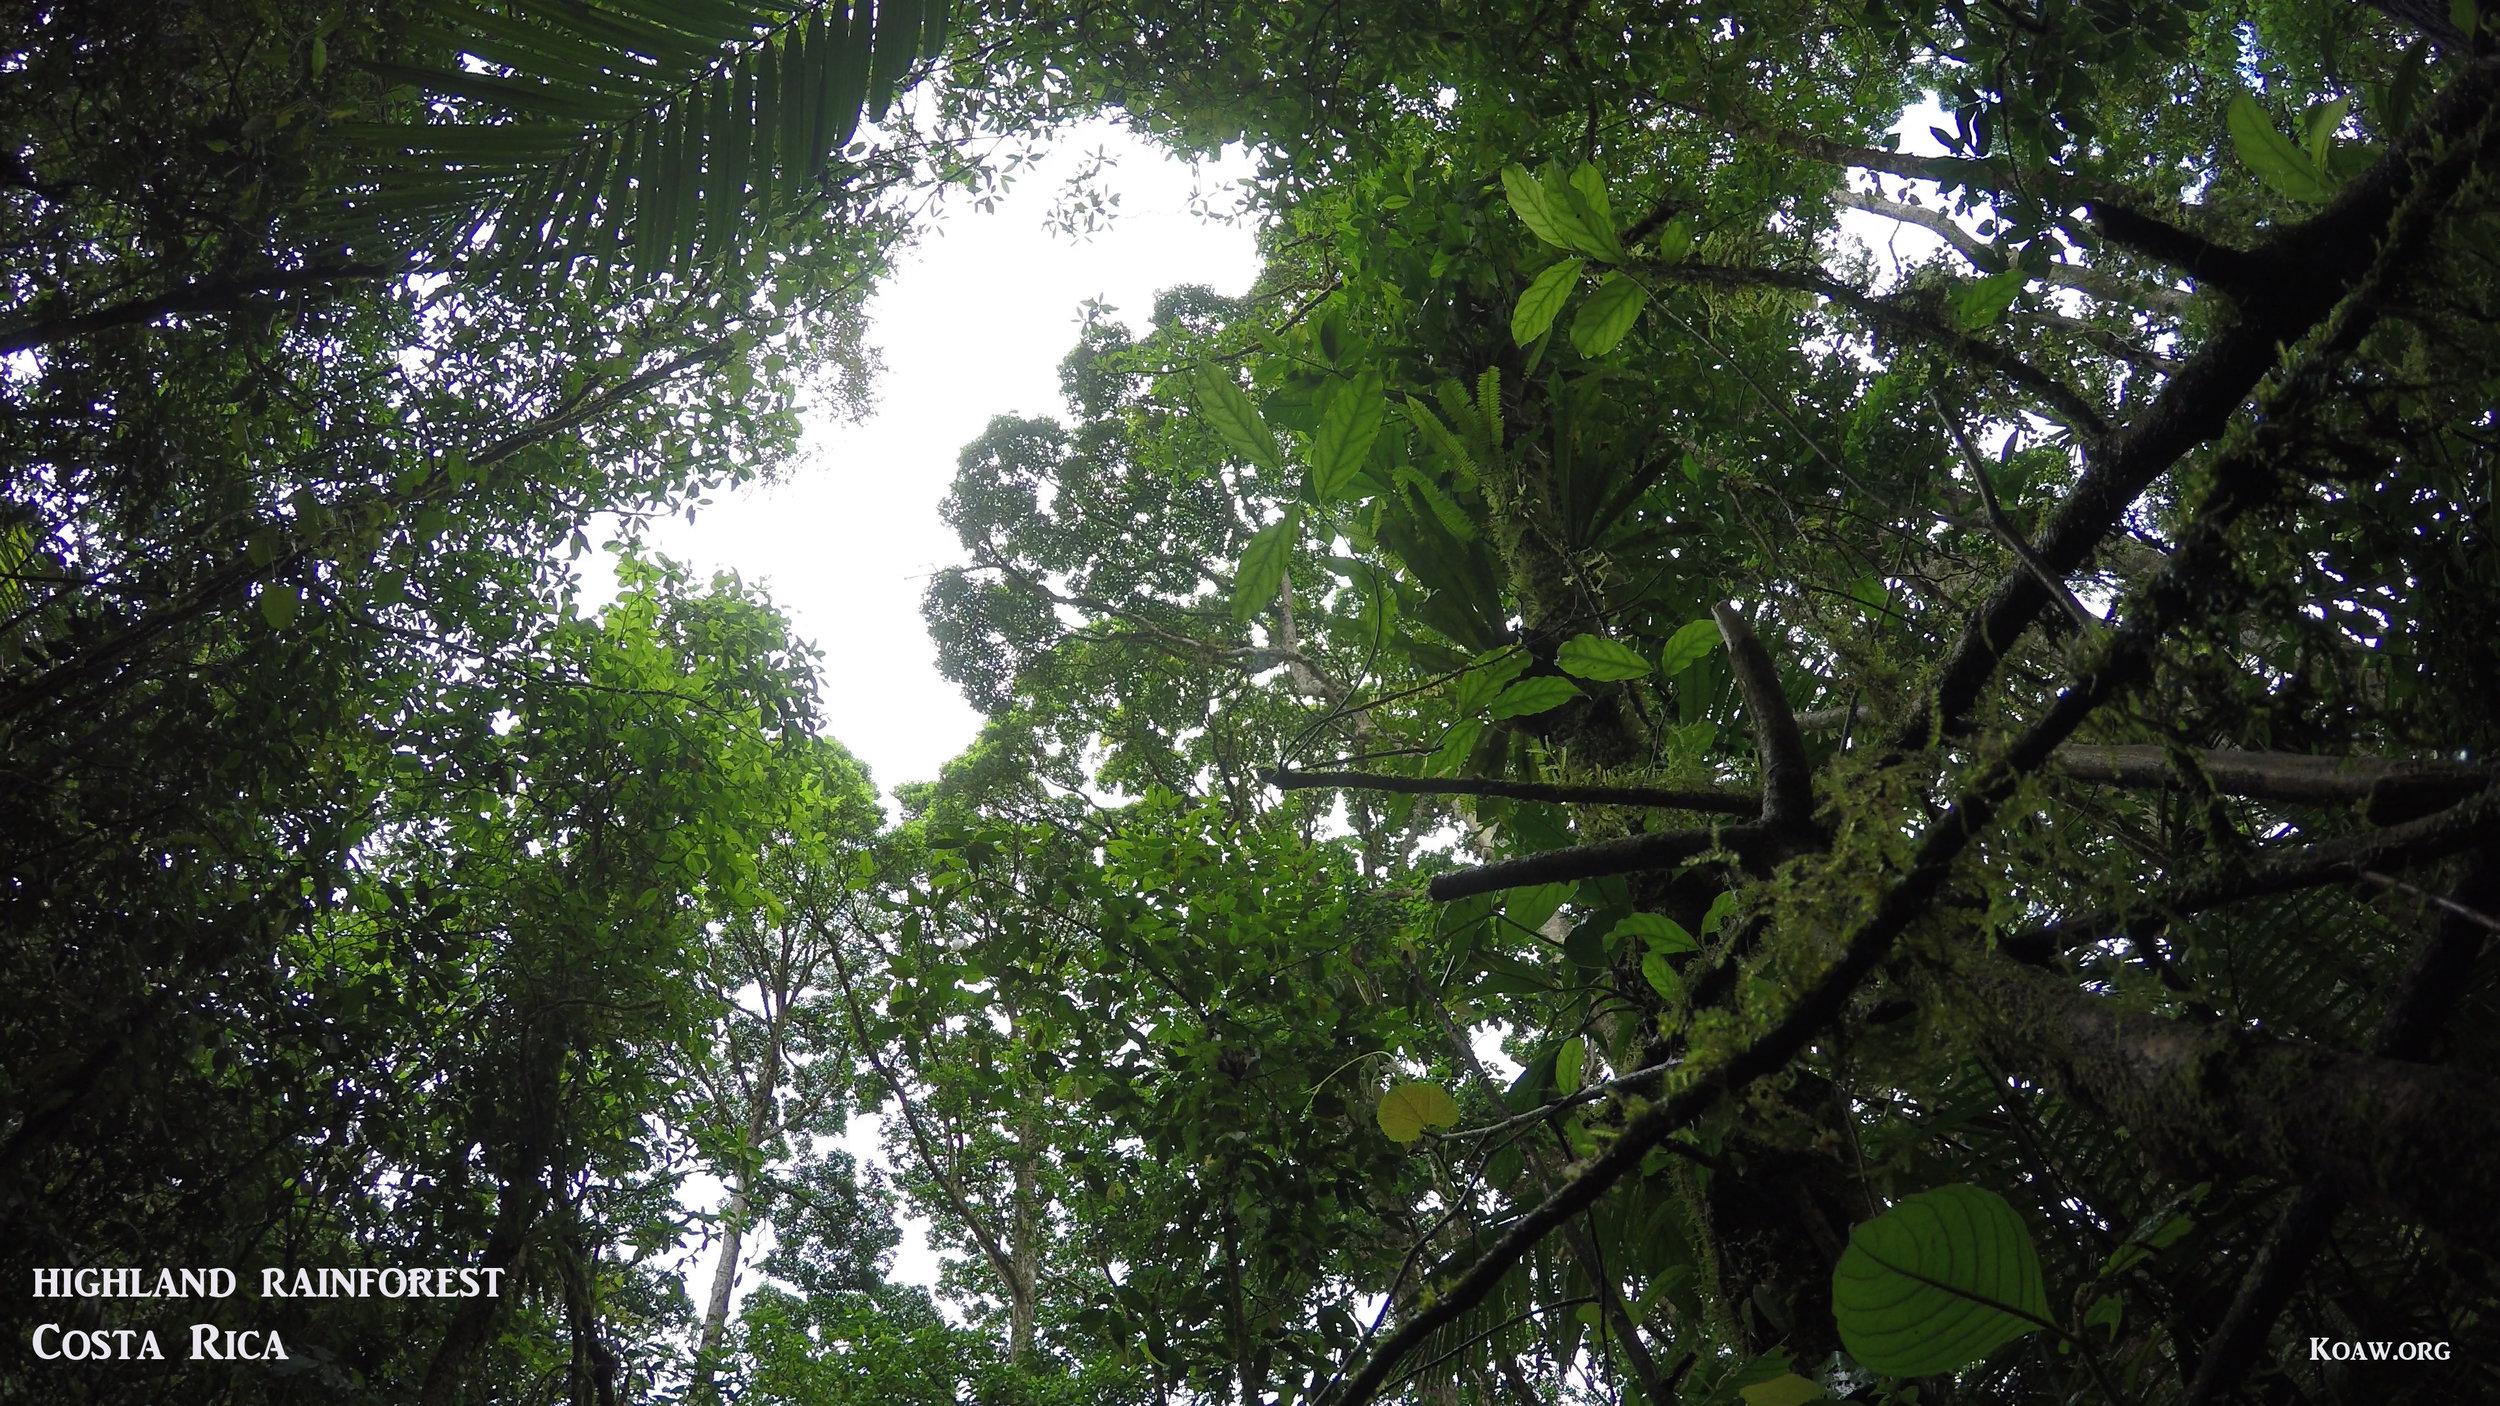 Highland Rainforest Cerro Chato